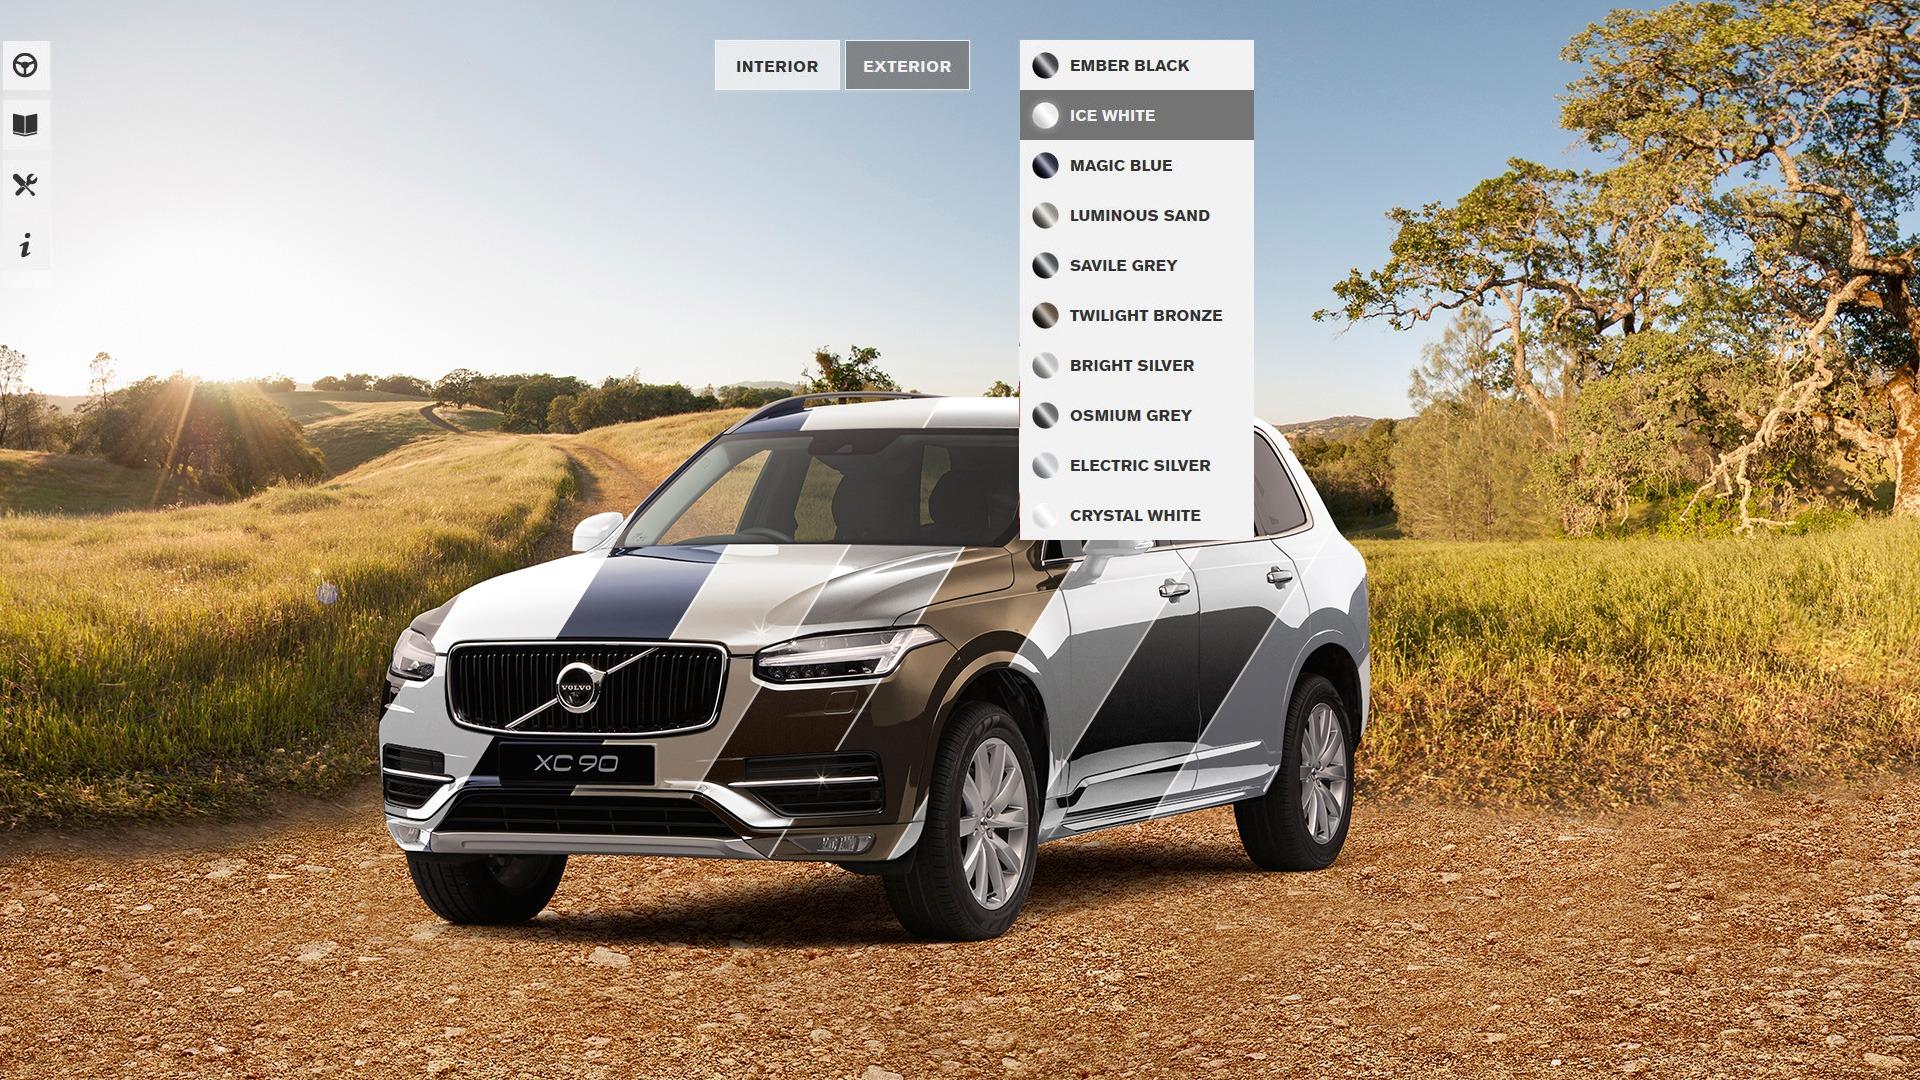 stas3dart-volvo-visualise-xc90-promotional-website-photo-grading